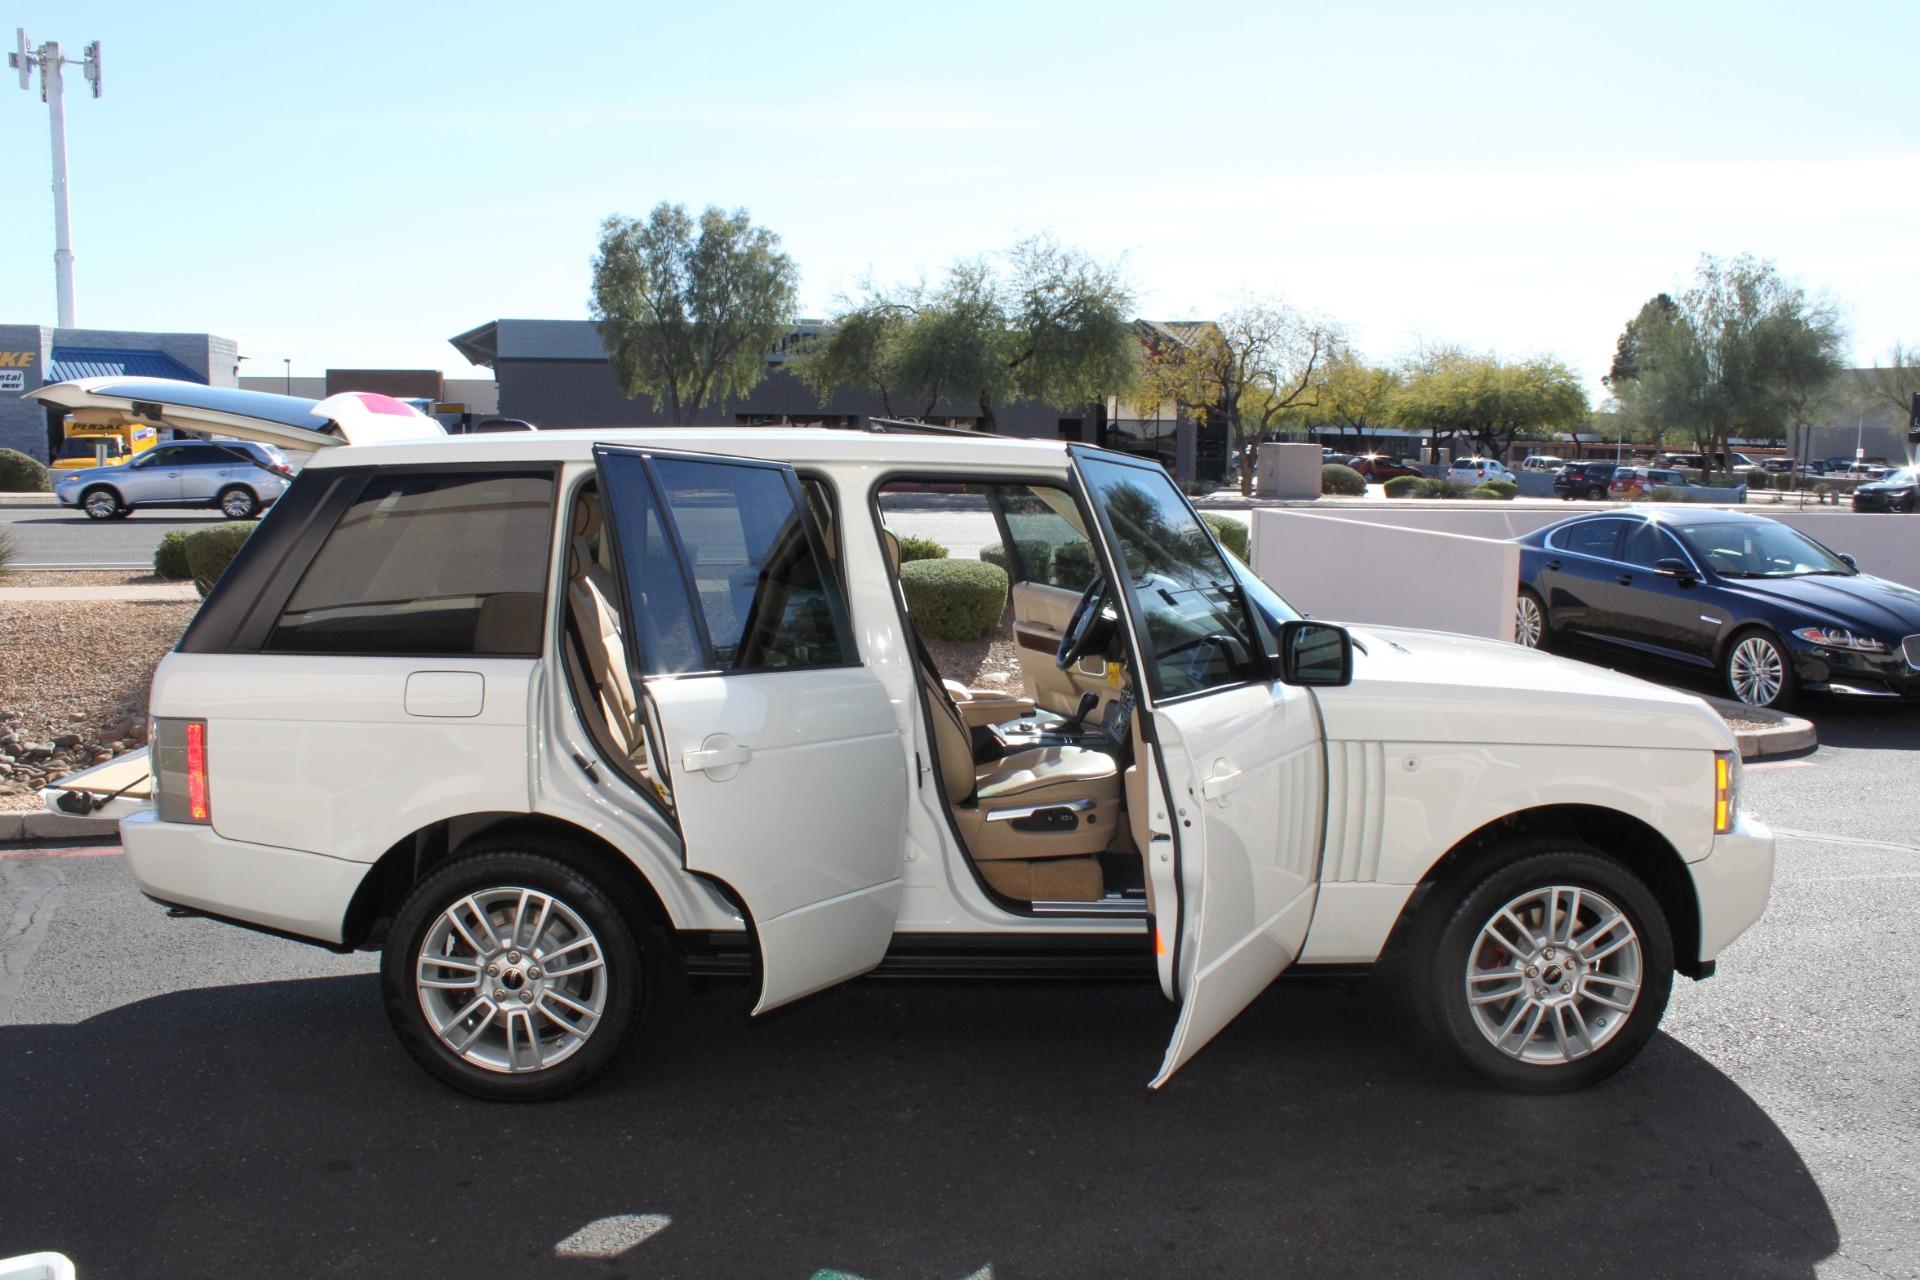 Used-2007-Land-Rover-Range-Rover-HSE-Honda